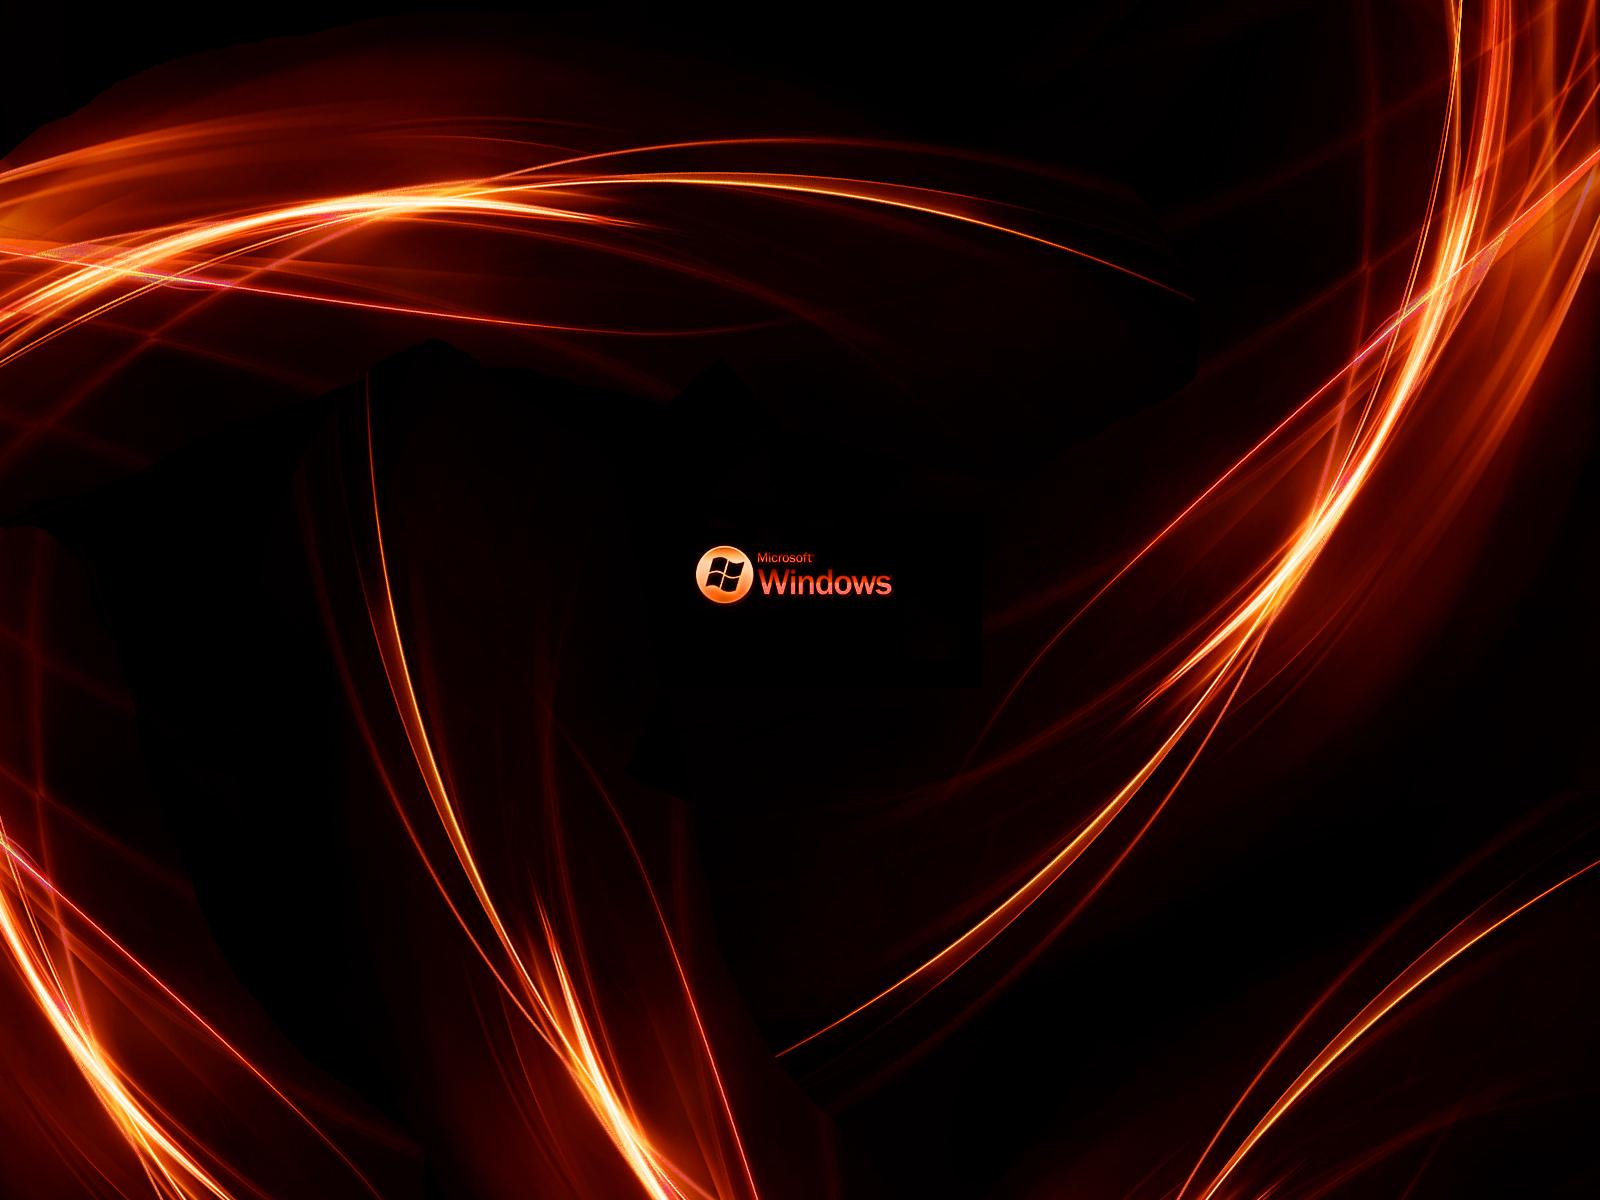 cfe954ec2225 Windows Orange Black Wallpaper 130 1600x1200